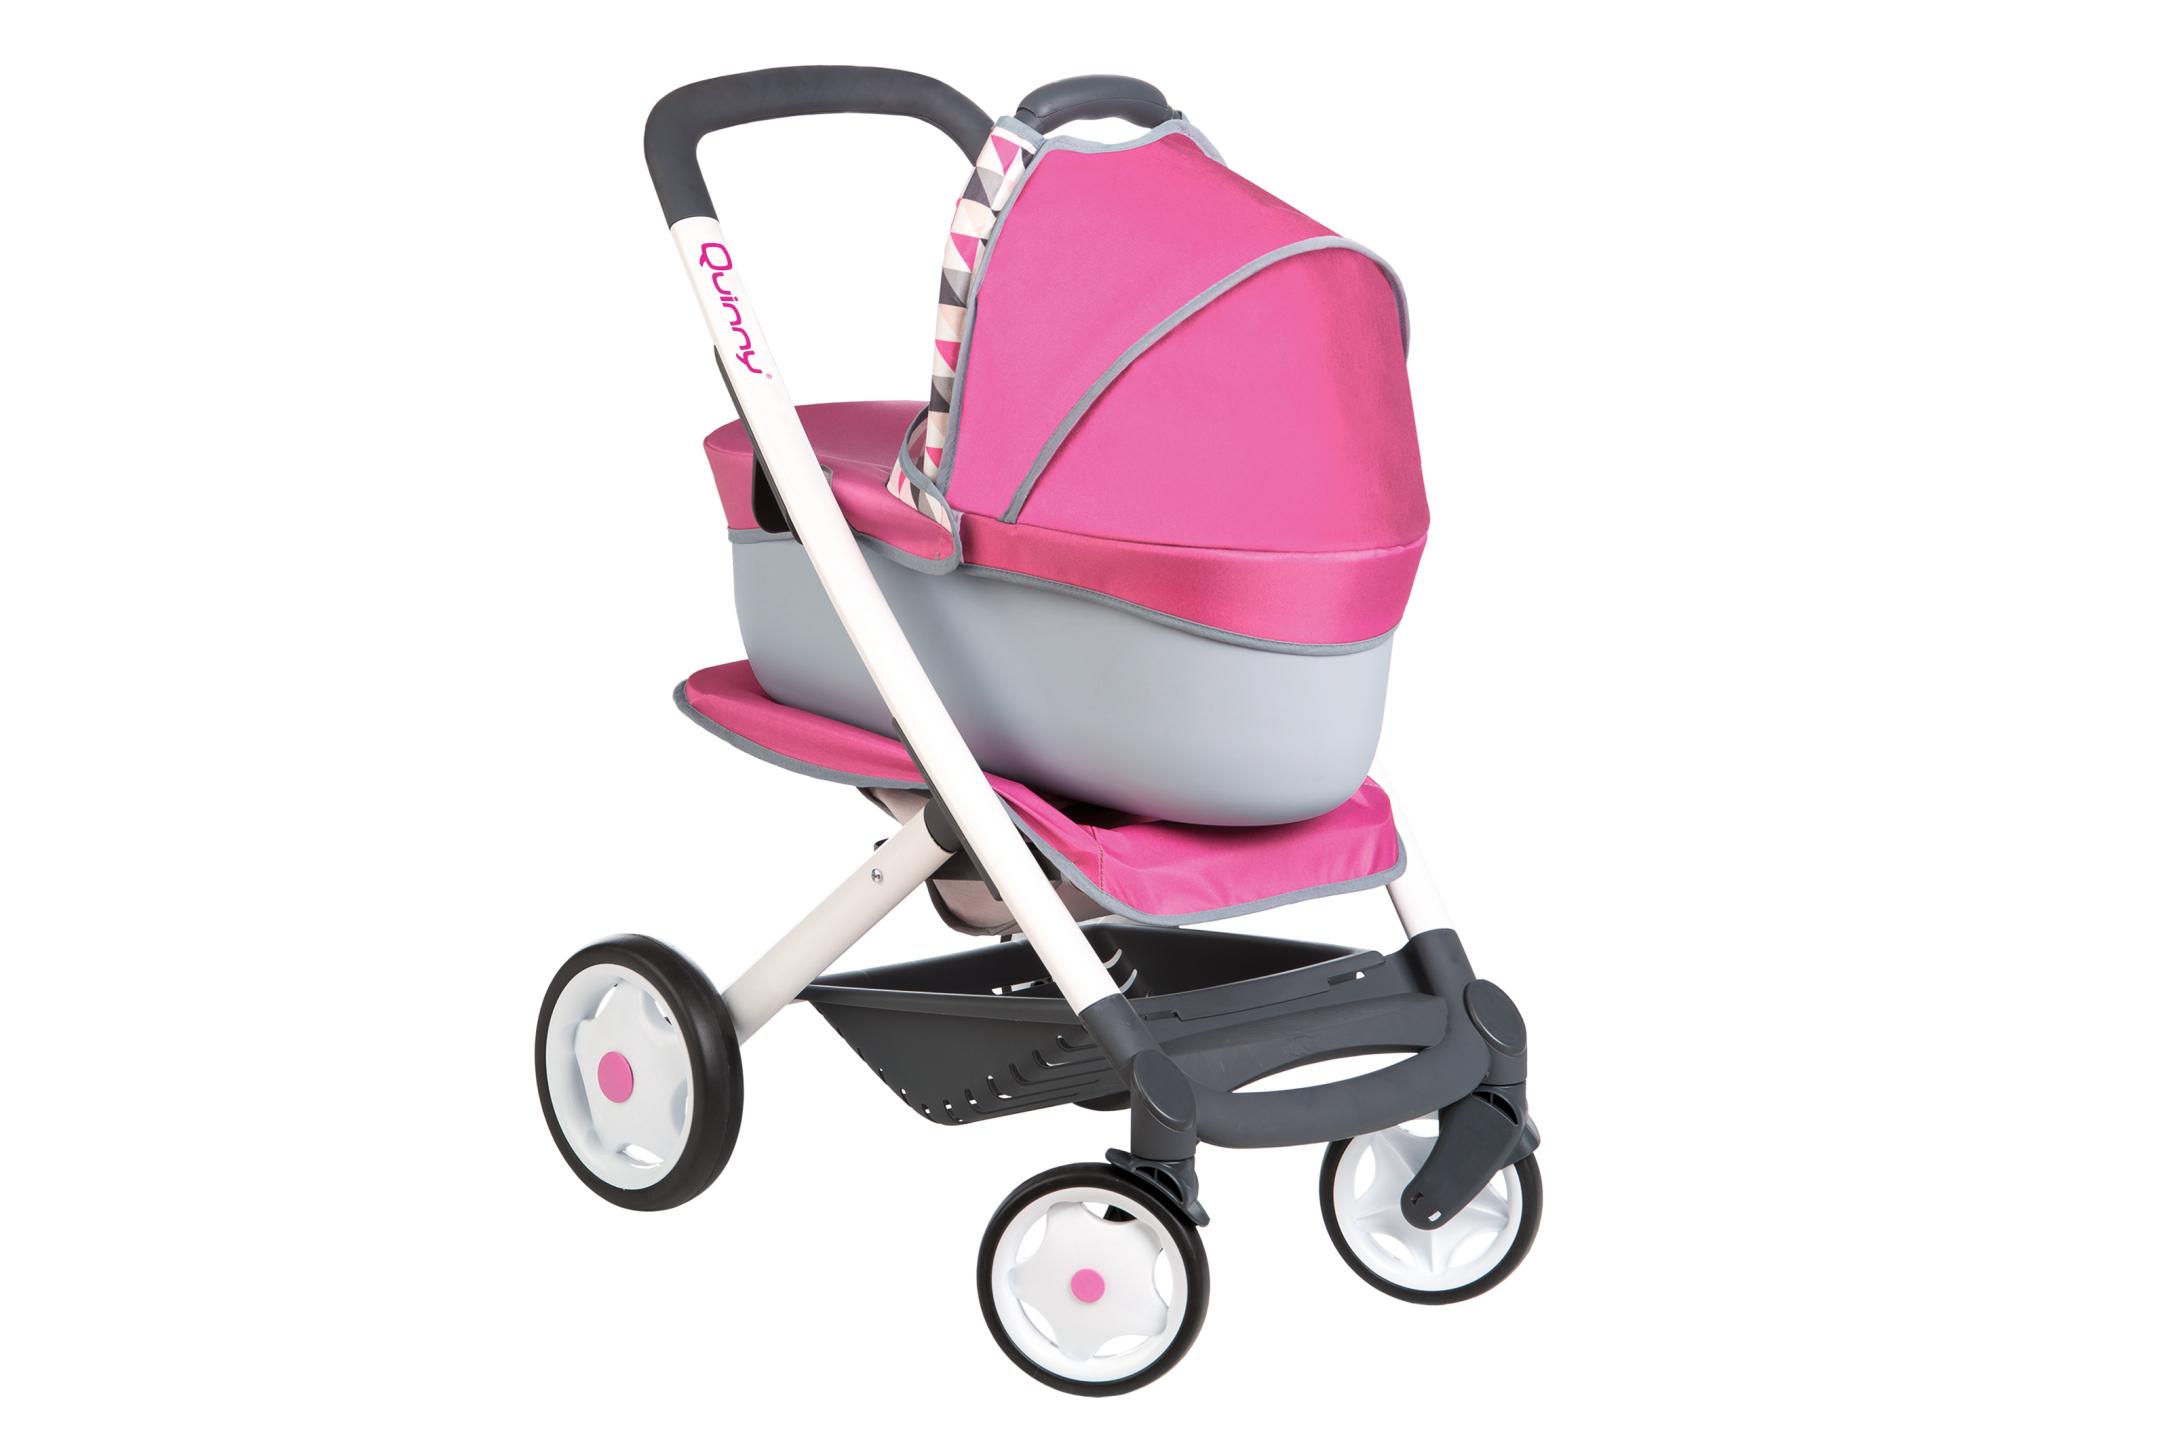 Quinny 3in1 Puppenwagen pink/grau